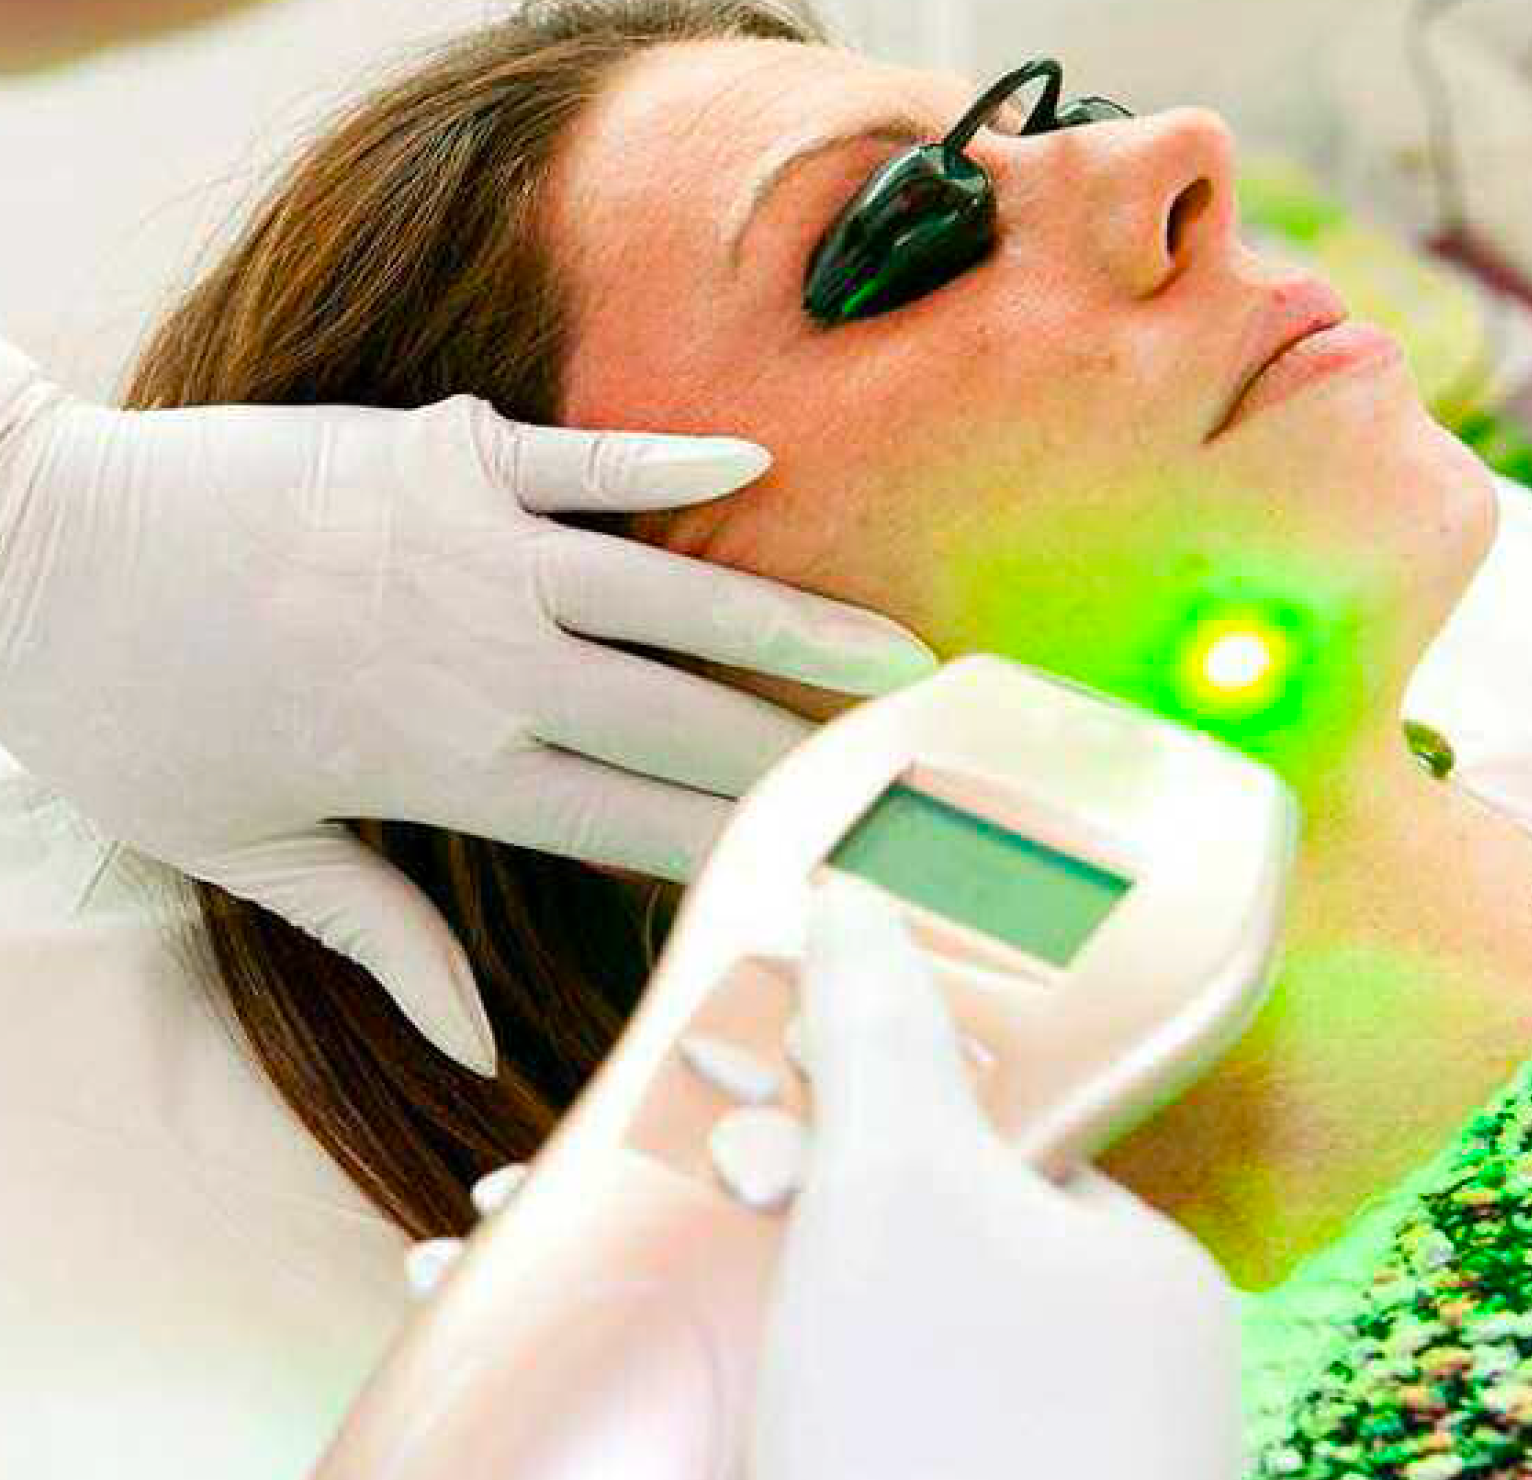 The Non-Surgical Face Lift